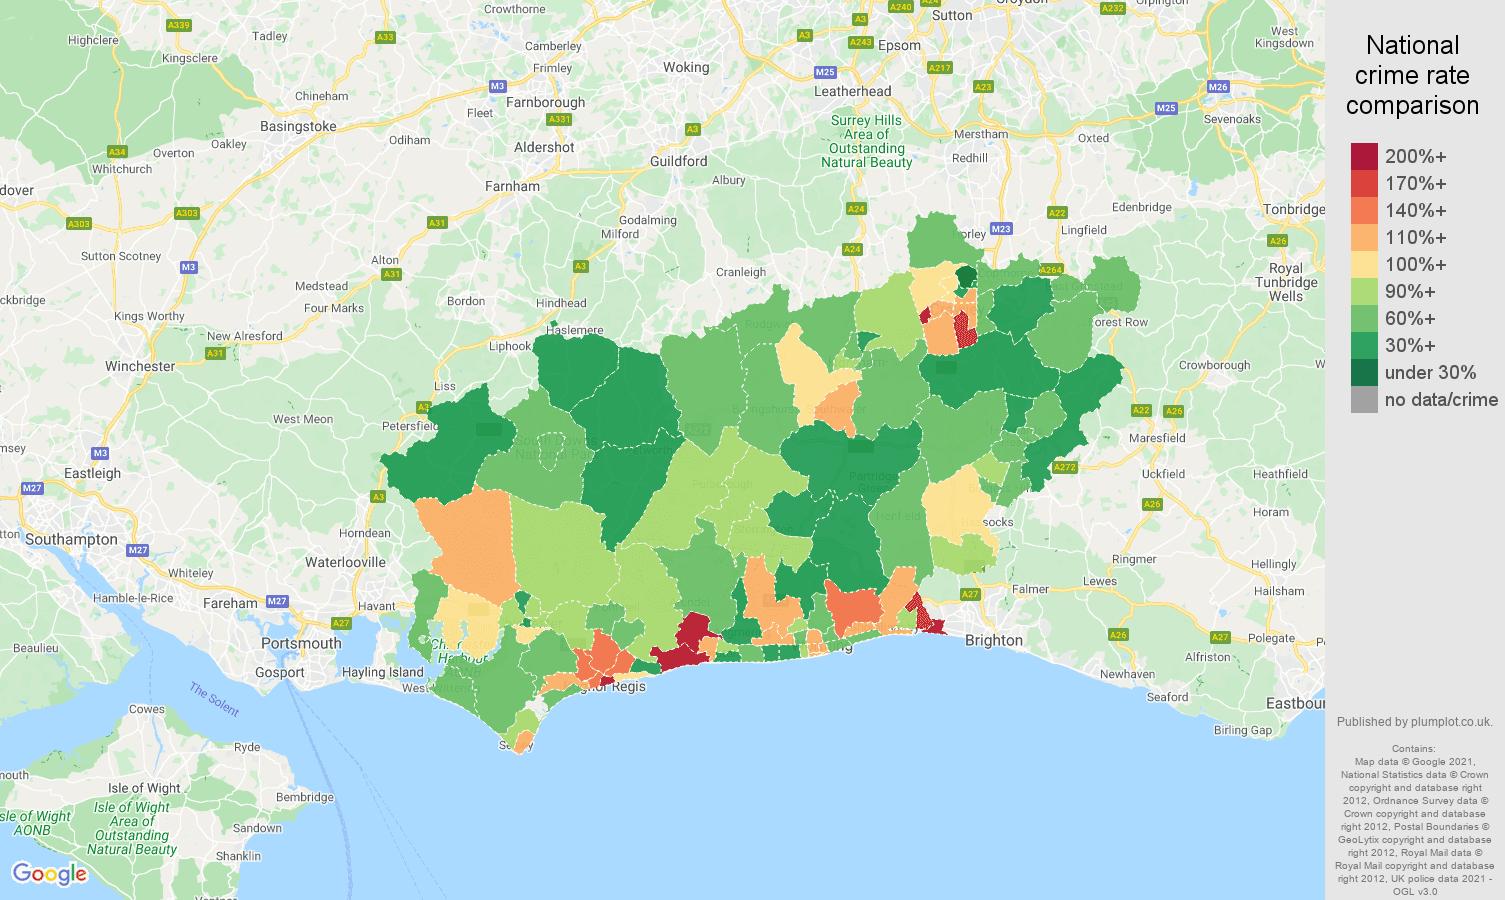 West Sussex criminal damage and arson crime rate comparison map